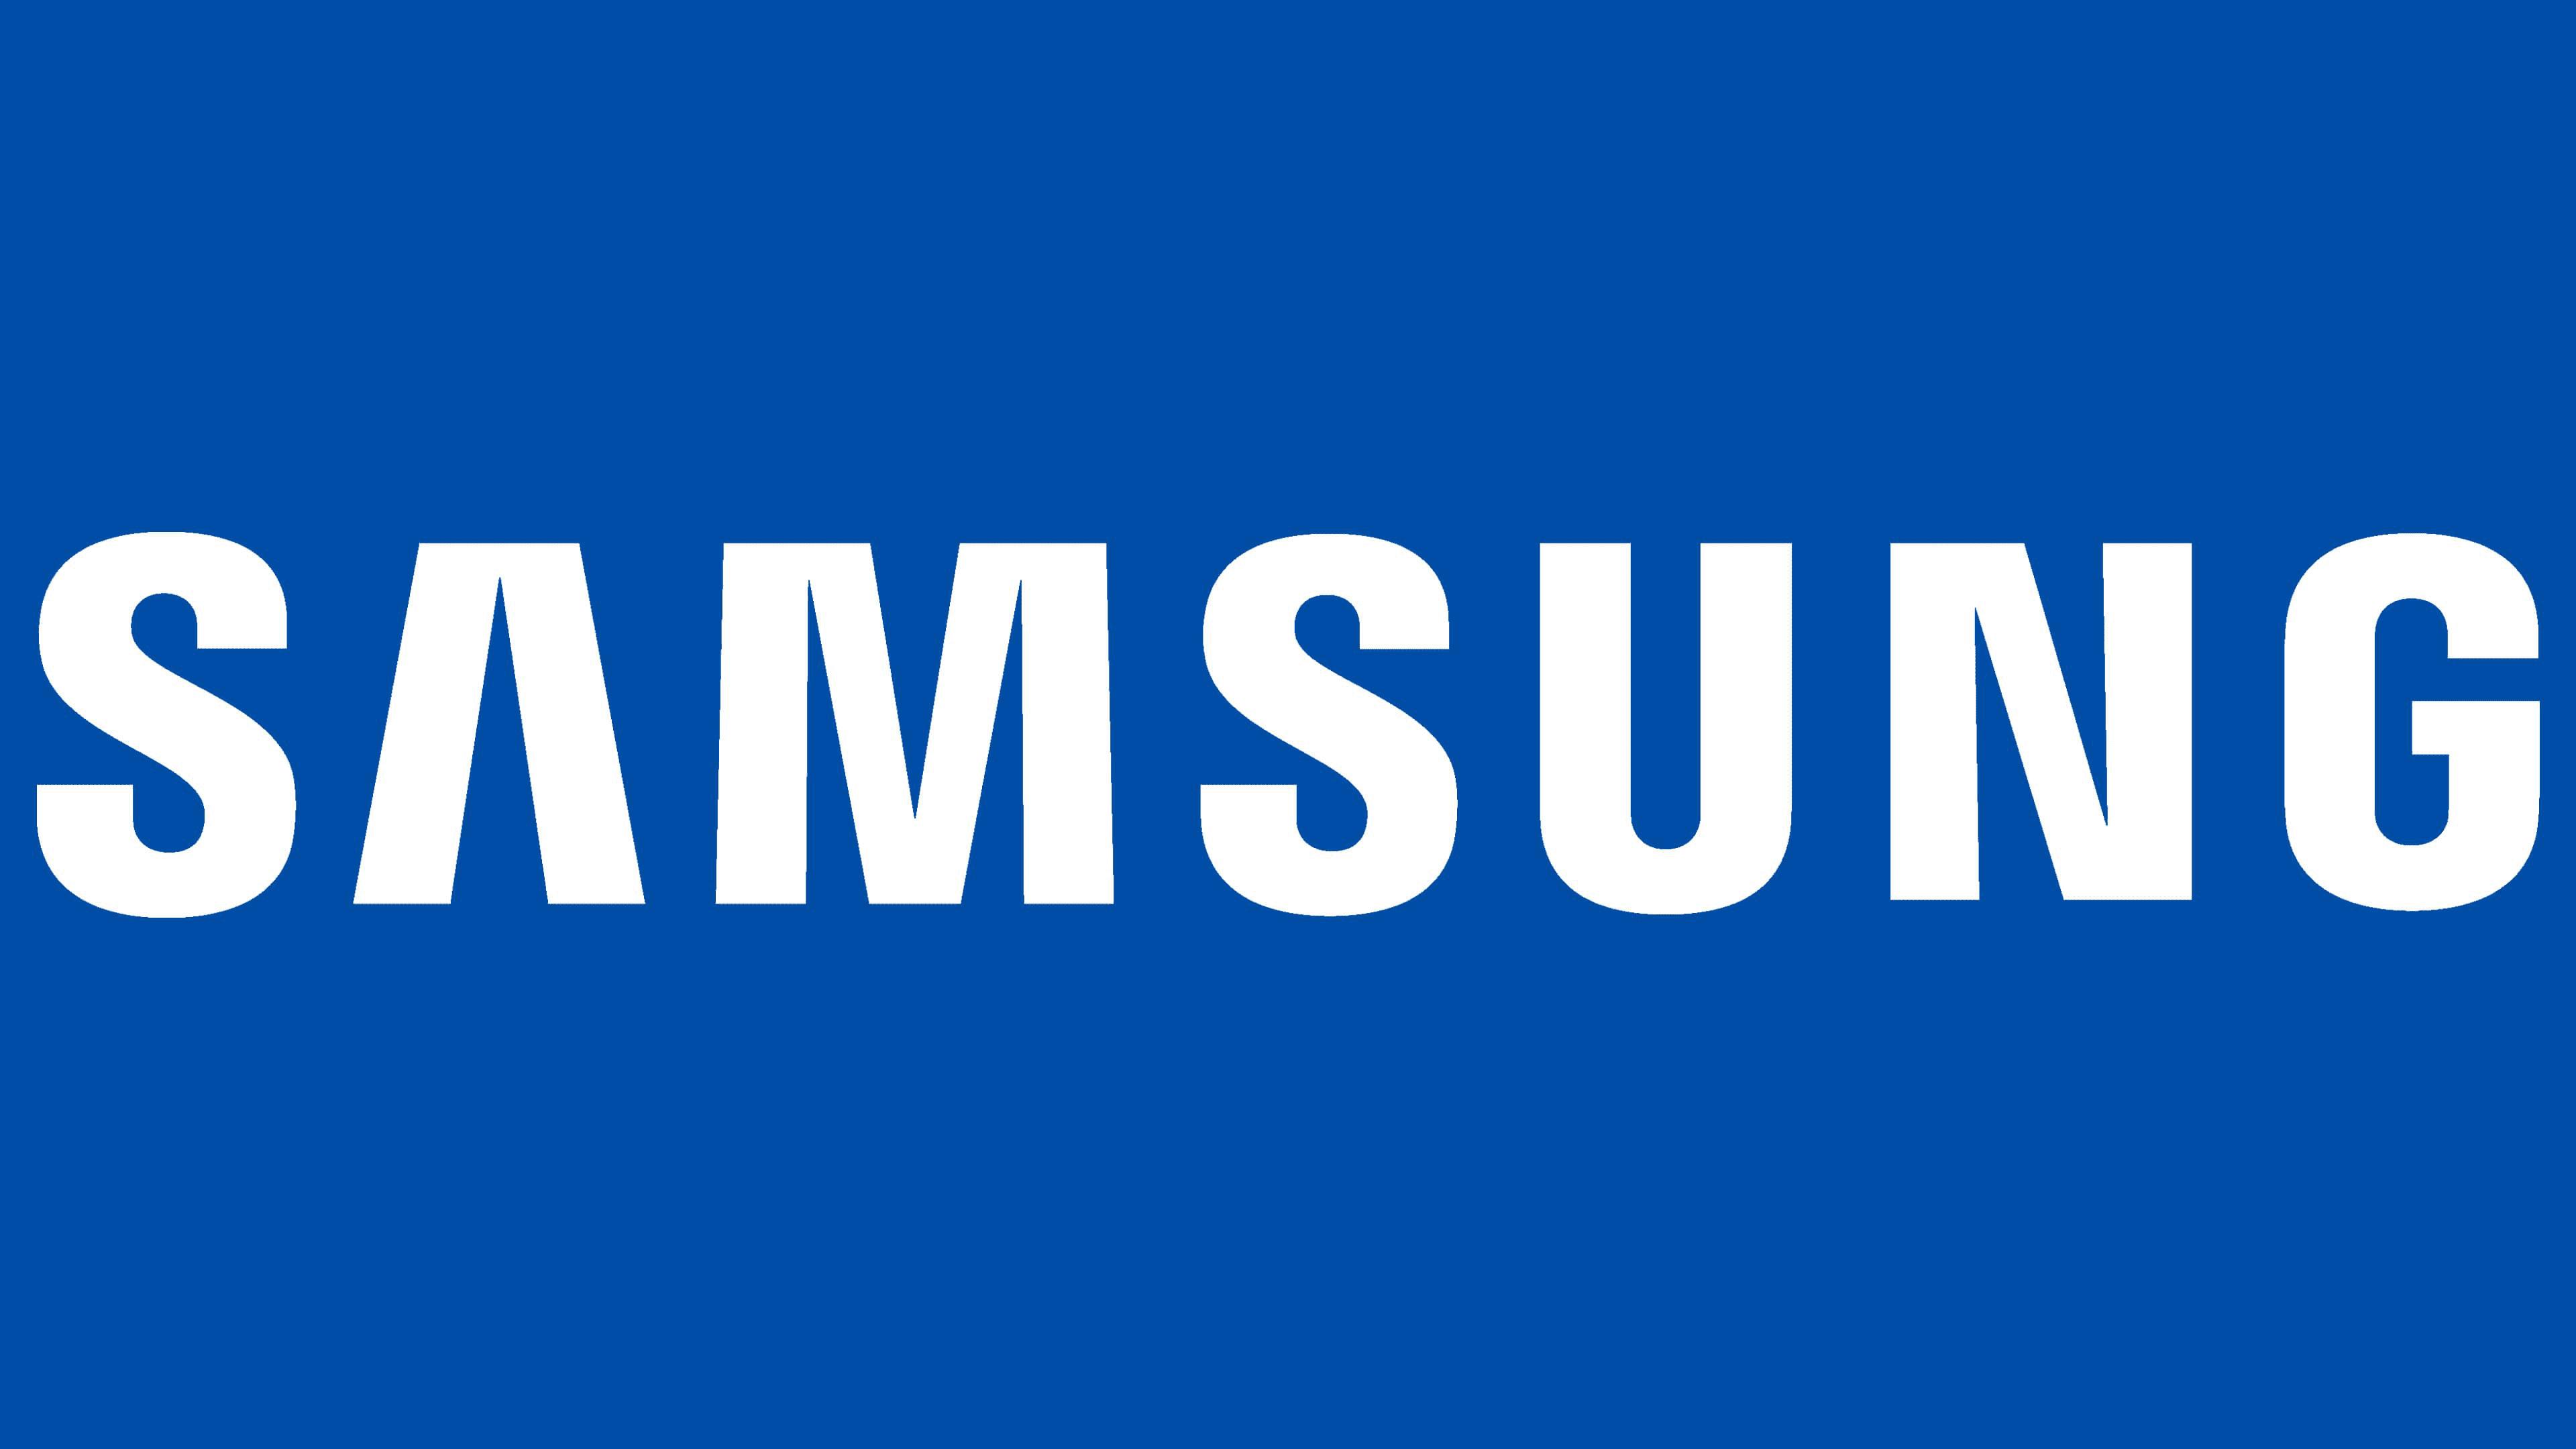 Samsung Emblem